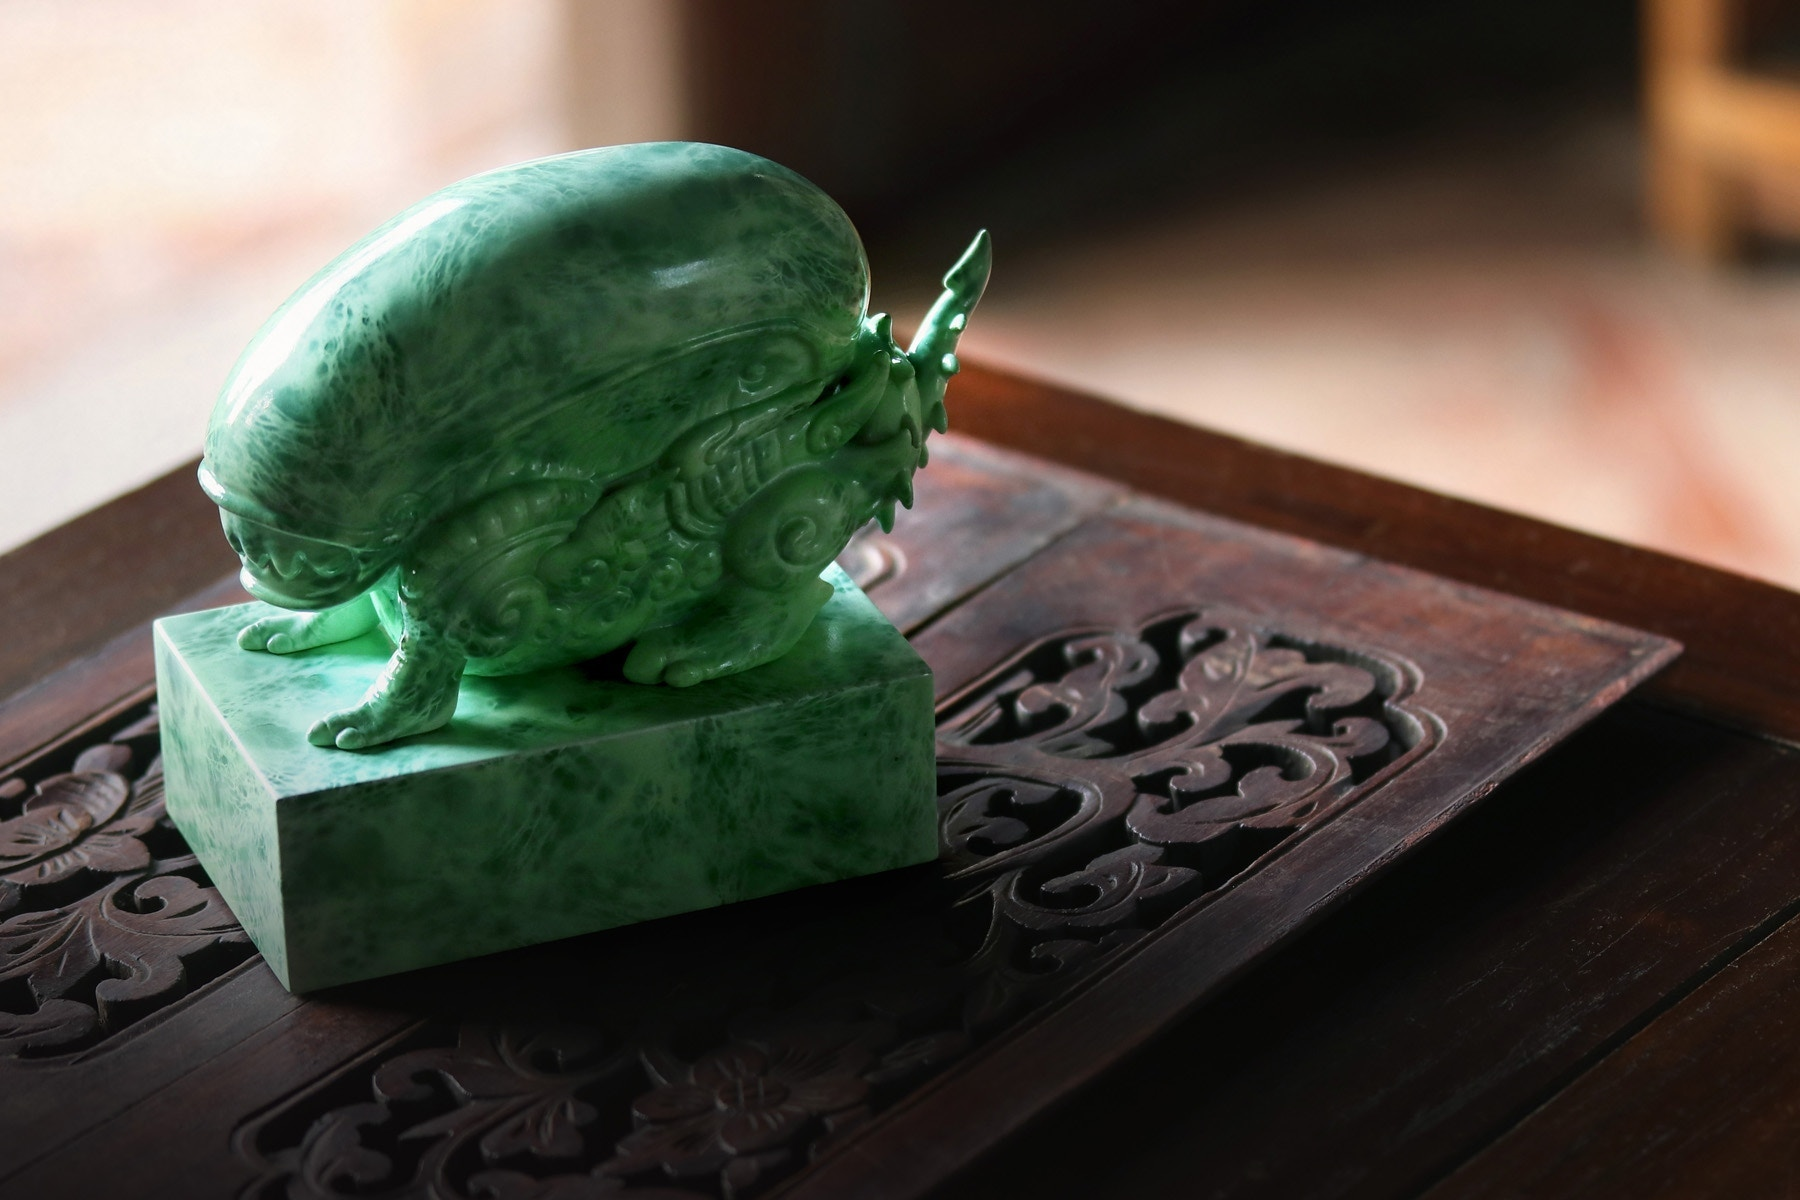 Cool 'Alien vs Predator' Jade-Like Figurines